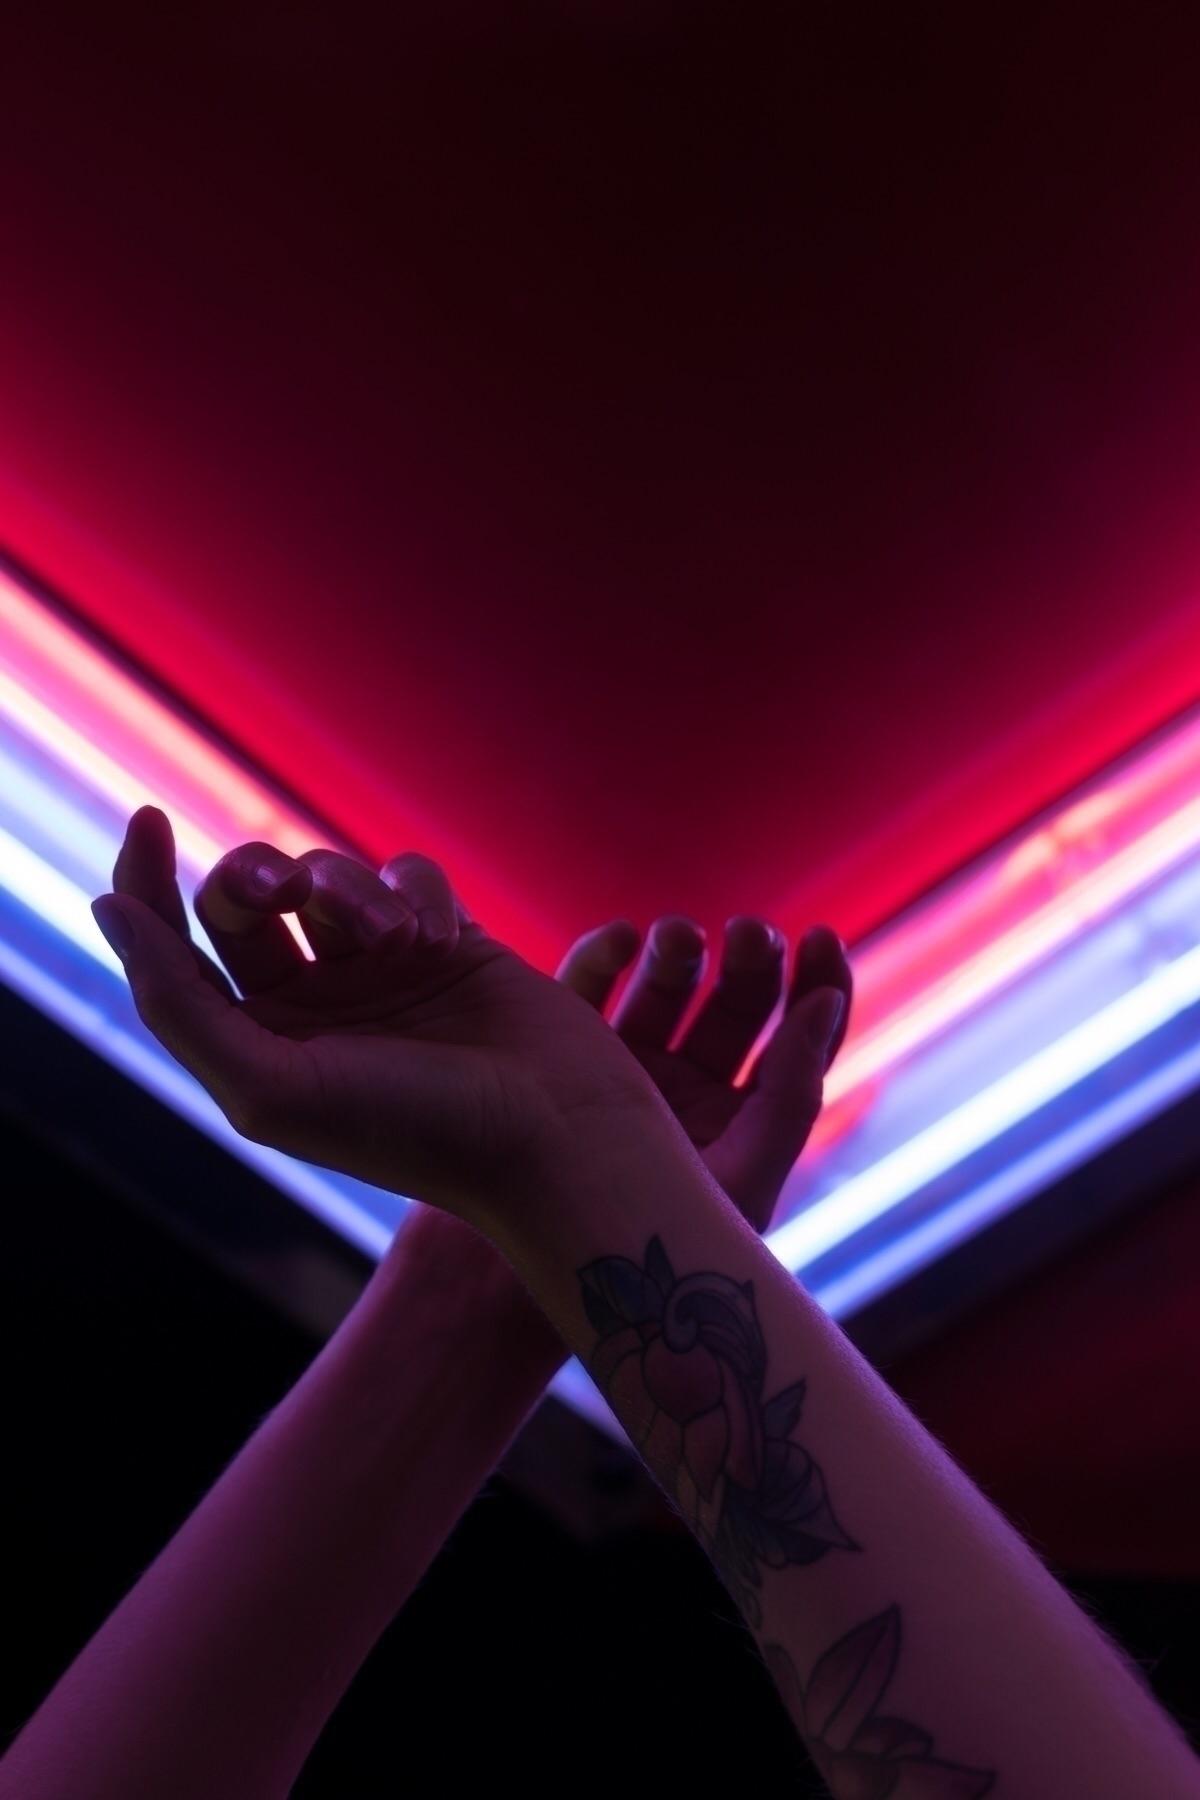 funfair, neon, lights, city, photography - oliviermorisse | ello